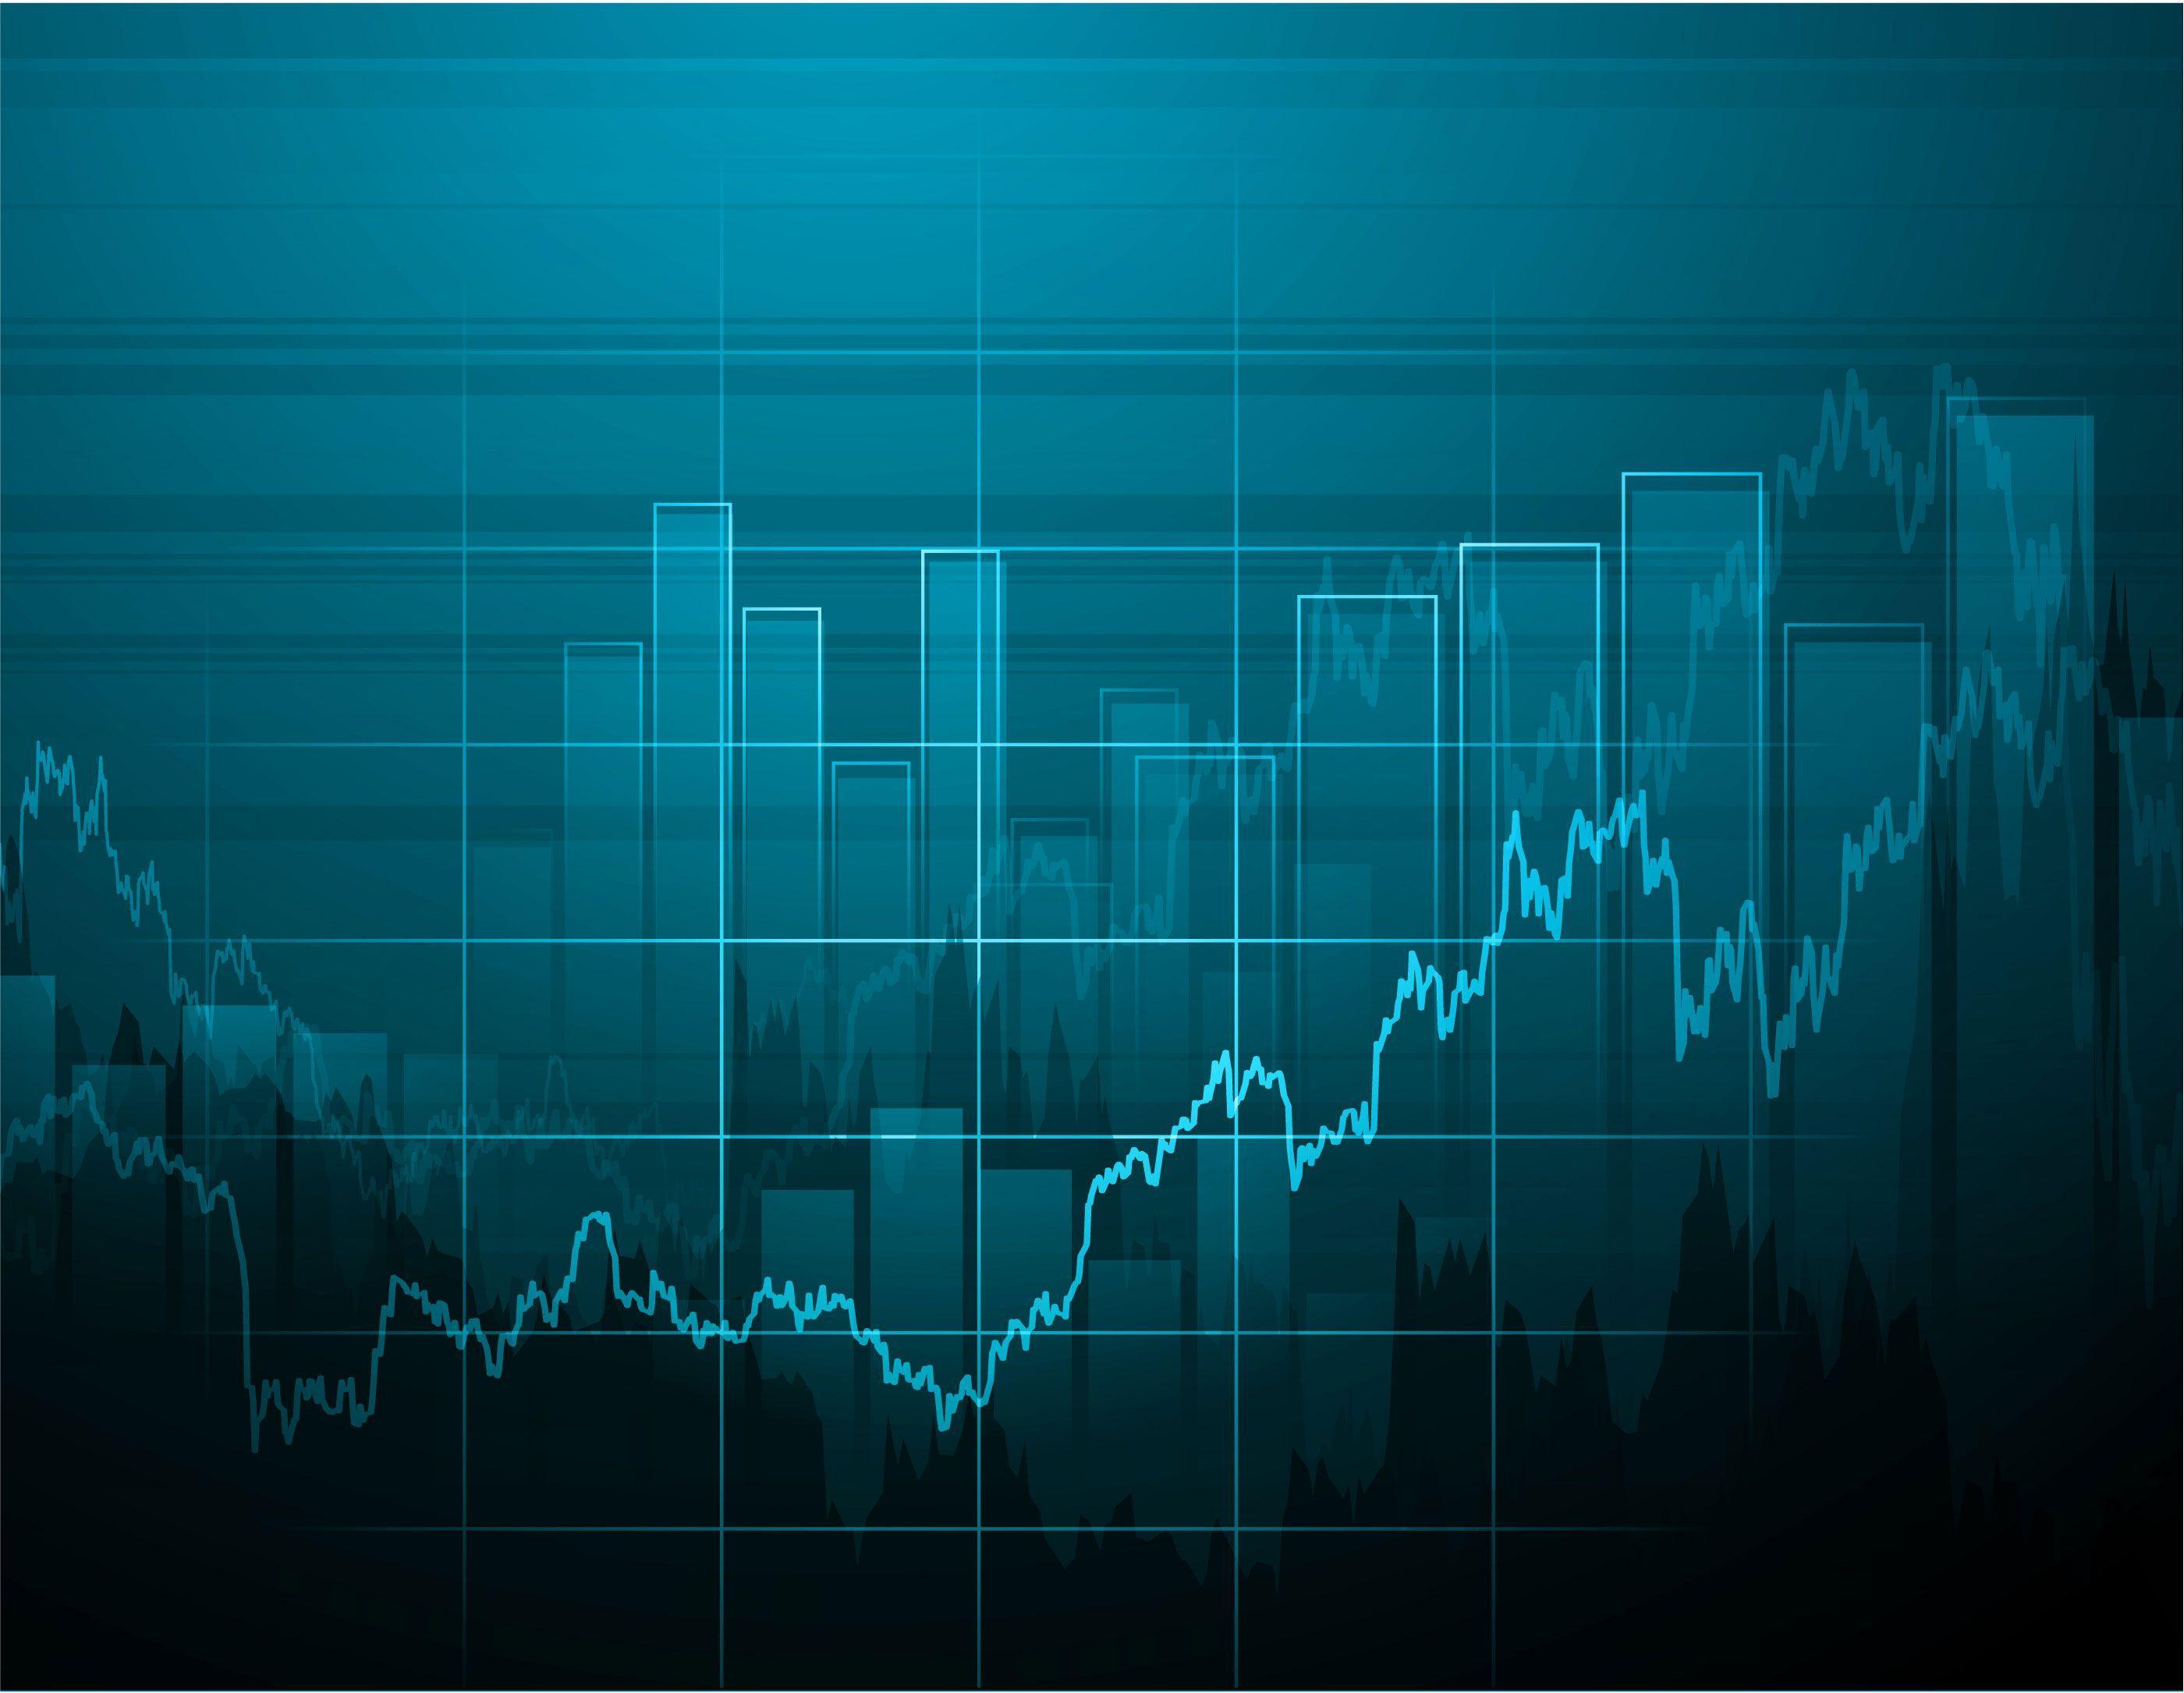 Stock Market Wallpaper   Trading Chart 1475006   HD Wallpaper 2800x2171